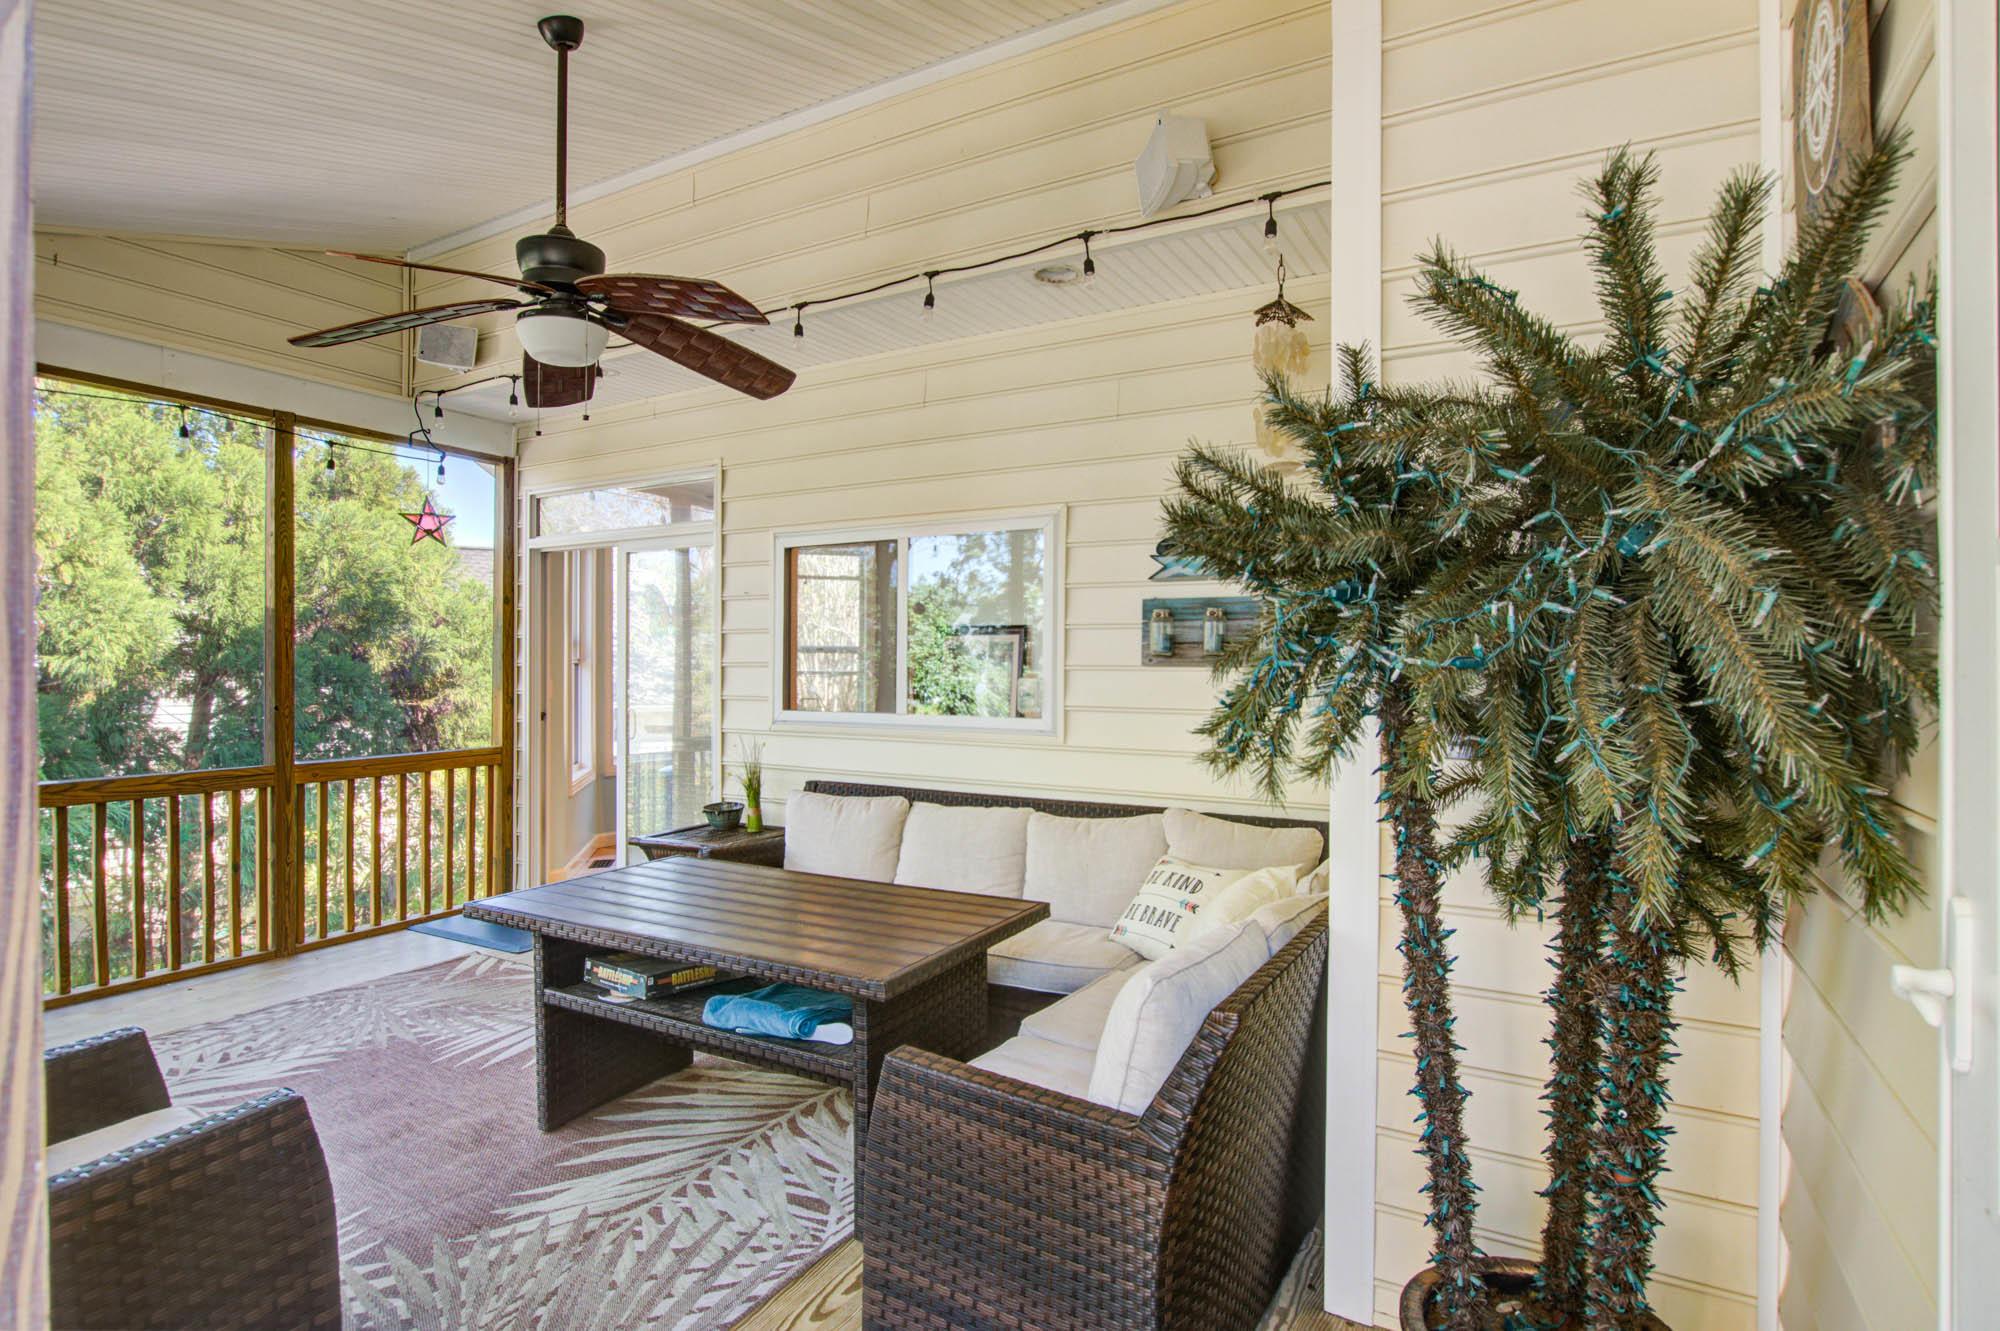 St Thomas Point Homes For Sale - 307 Jamesbury, Charleston, SC - 29